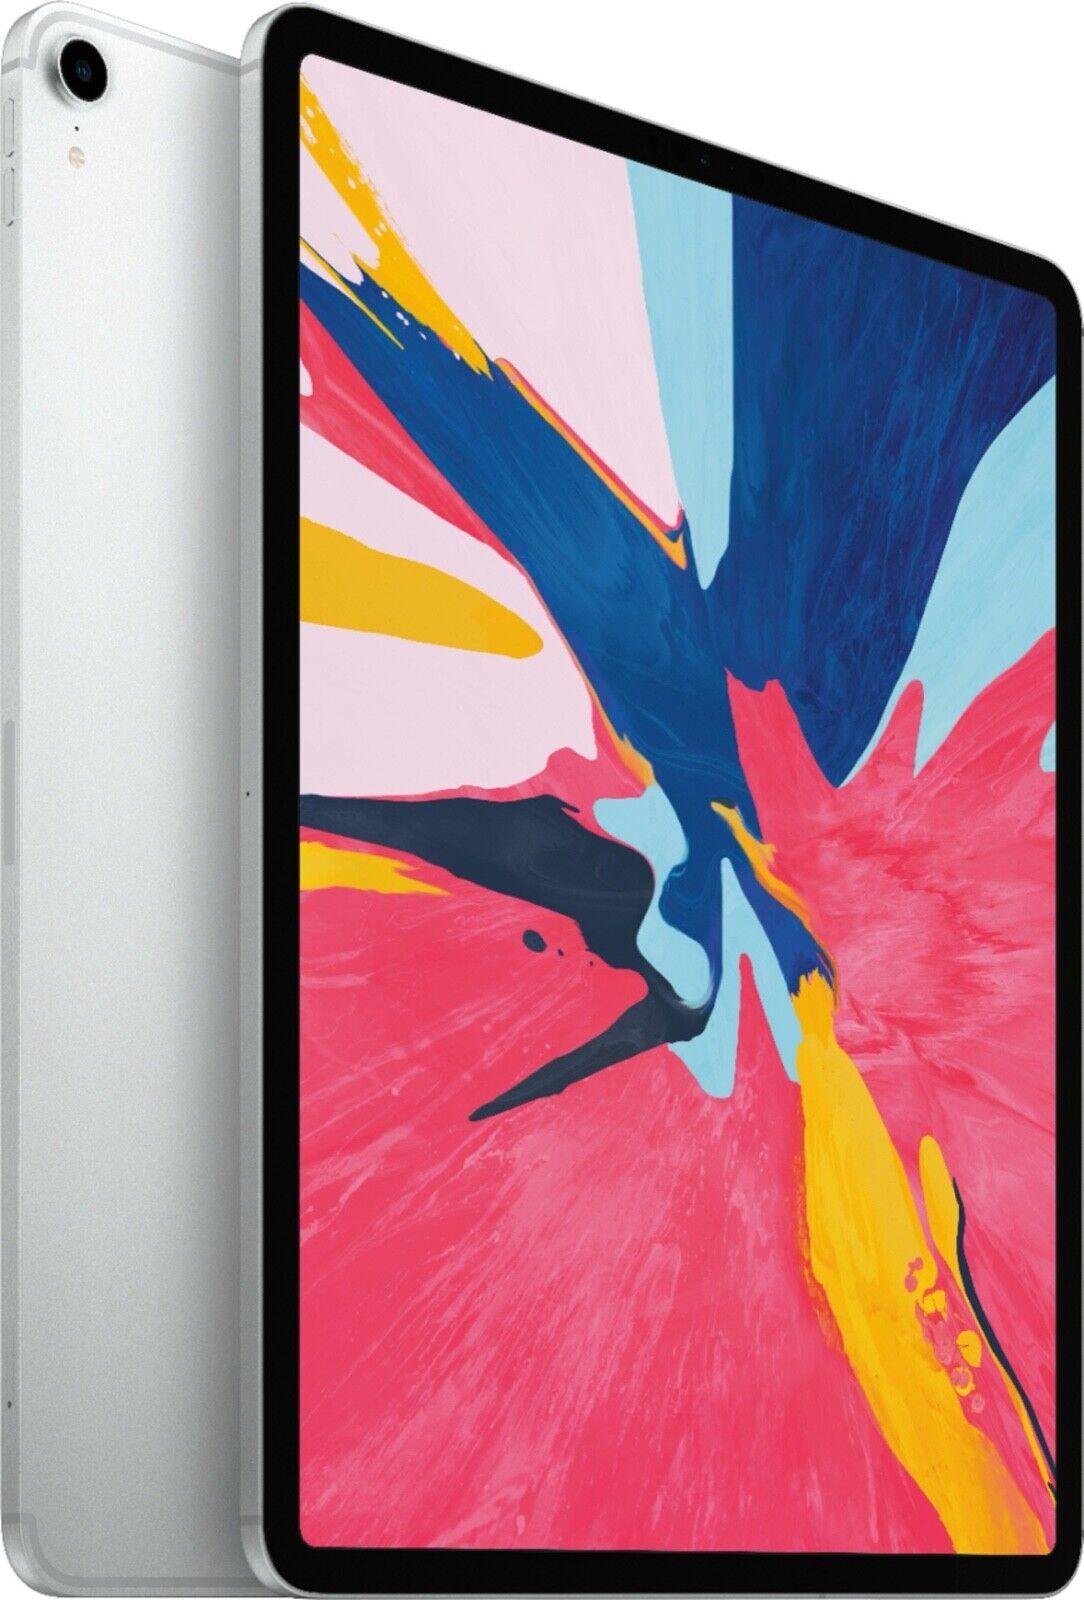 NEW Sealed Apple iPad Pro 3rd Gen 64GB, Wi-Fi & Cellular 12.9